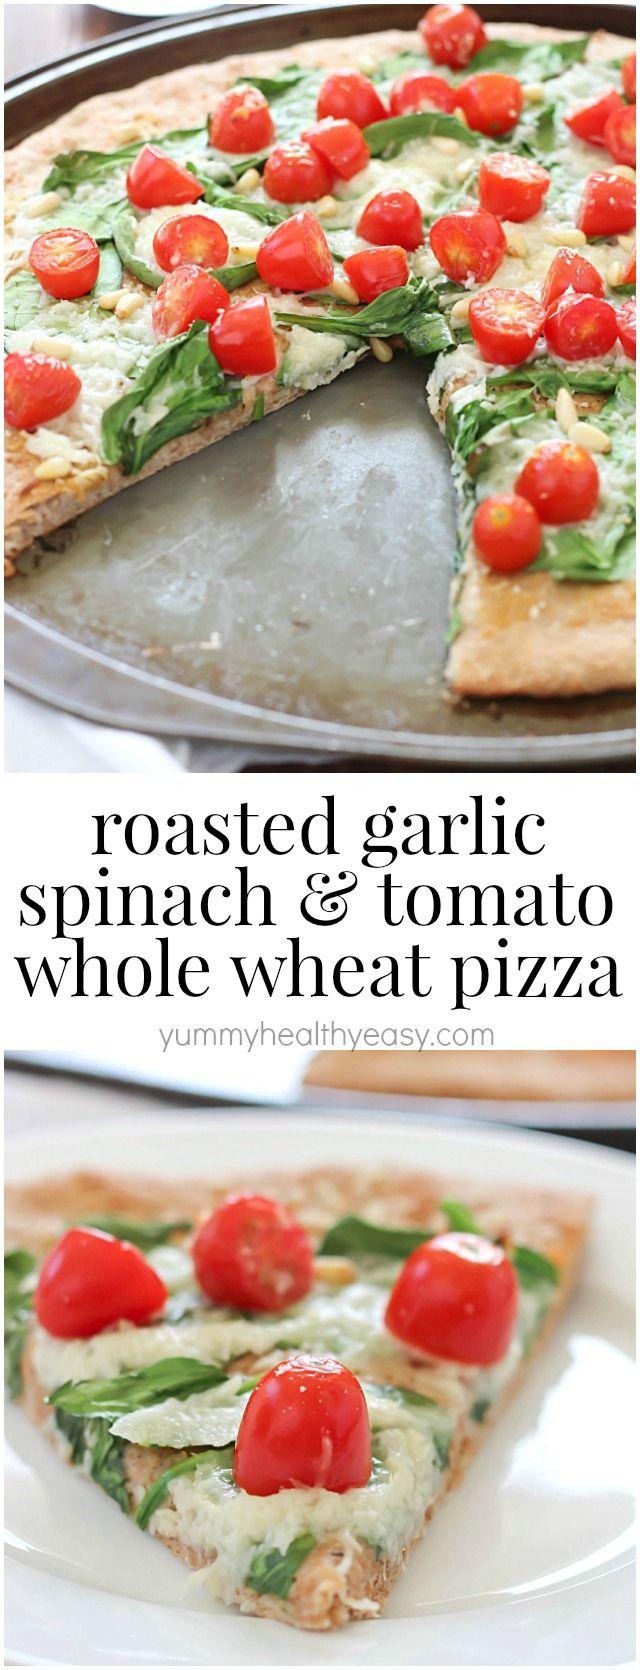 17 Best images about Recipes - VEGAN or VEG. on Pinterest | Crash hot ...